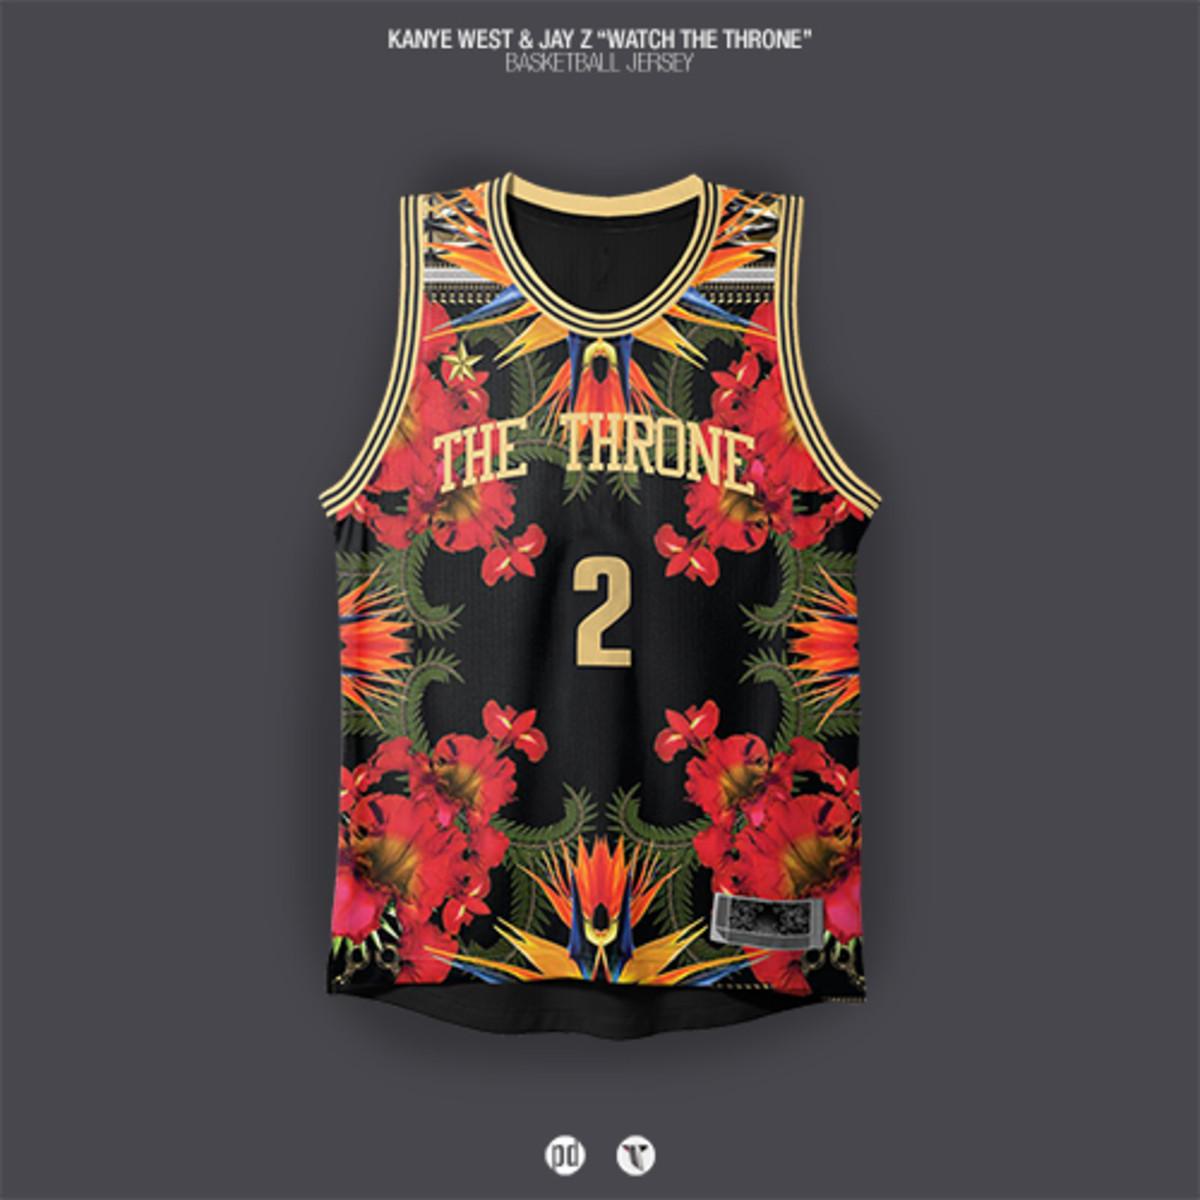 kanye-west-jay-z-watch-the-throne-jersey.jpg